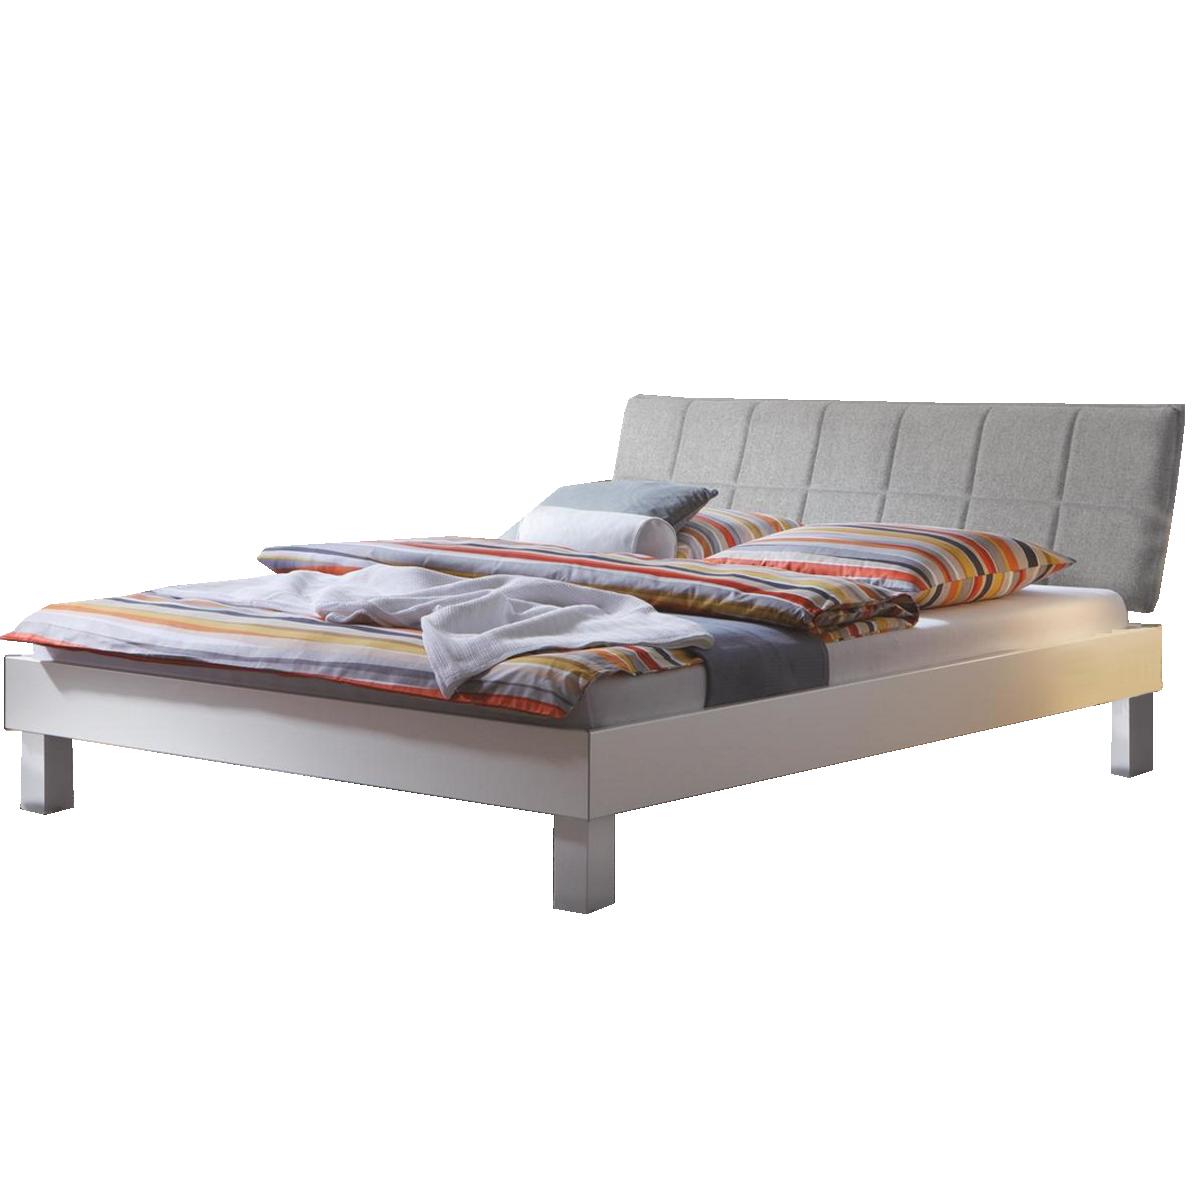 Full Size of Hasena Soft Line Bett In 180x200 Cm Bettrahmen Noble 14 Kopfteil Malta Barock 200x220 Team 7 Betten Flexa Mit Bettkasten 140x220 Designer 160x200 Rauch Bett 180x200 Bett